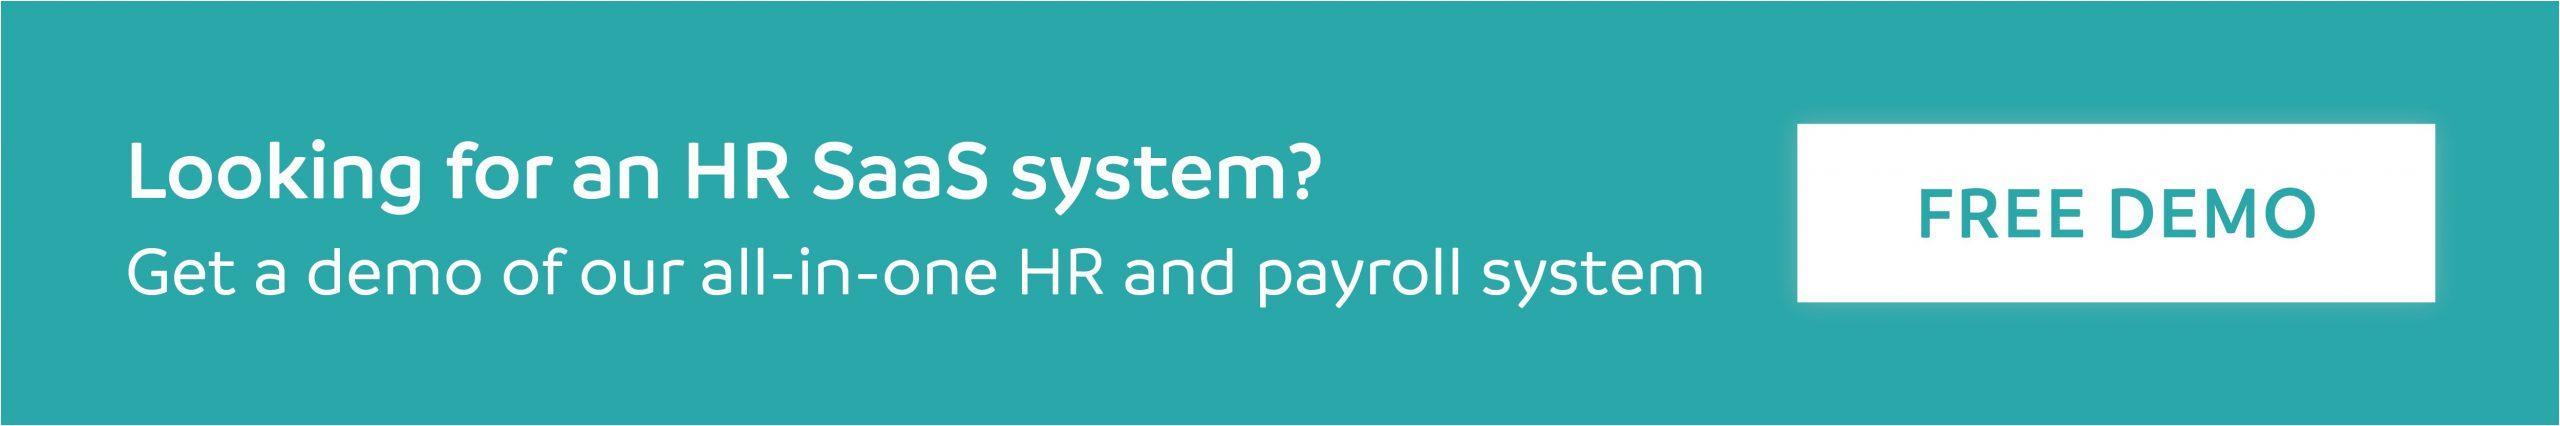 HR SaaS systems